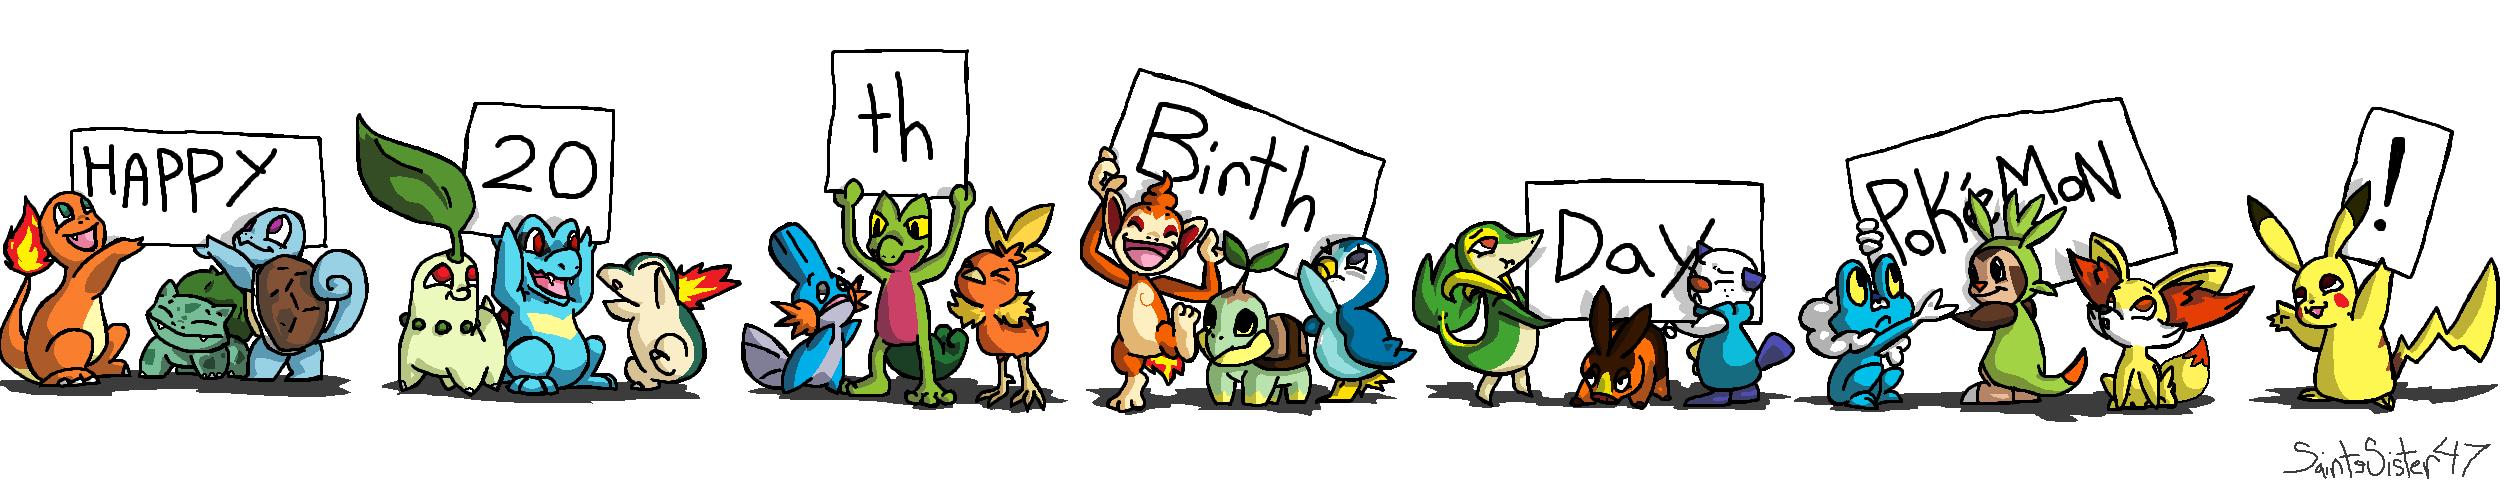 Happy 20th Birthday Pokemon! by SaintsSister47